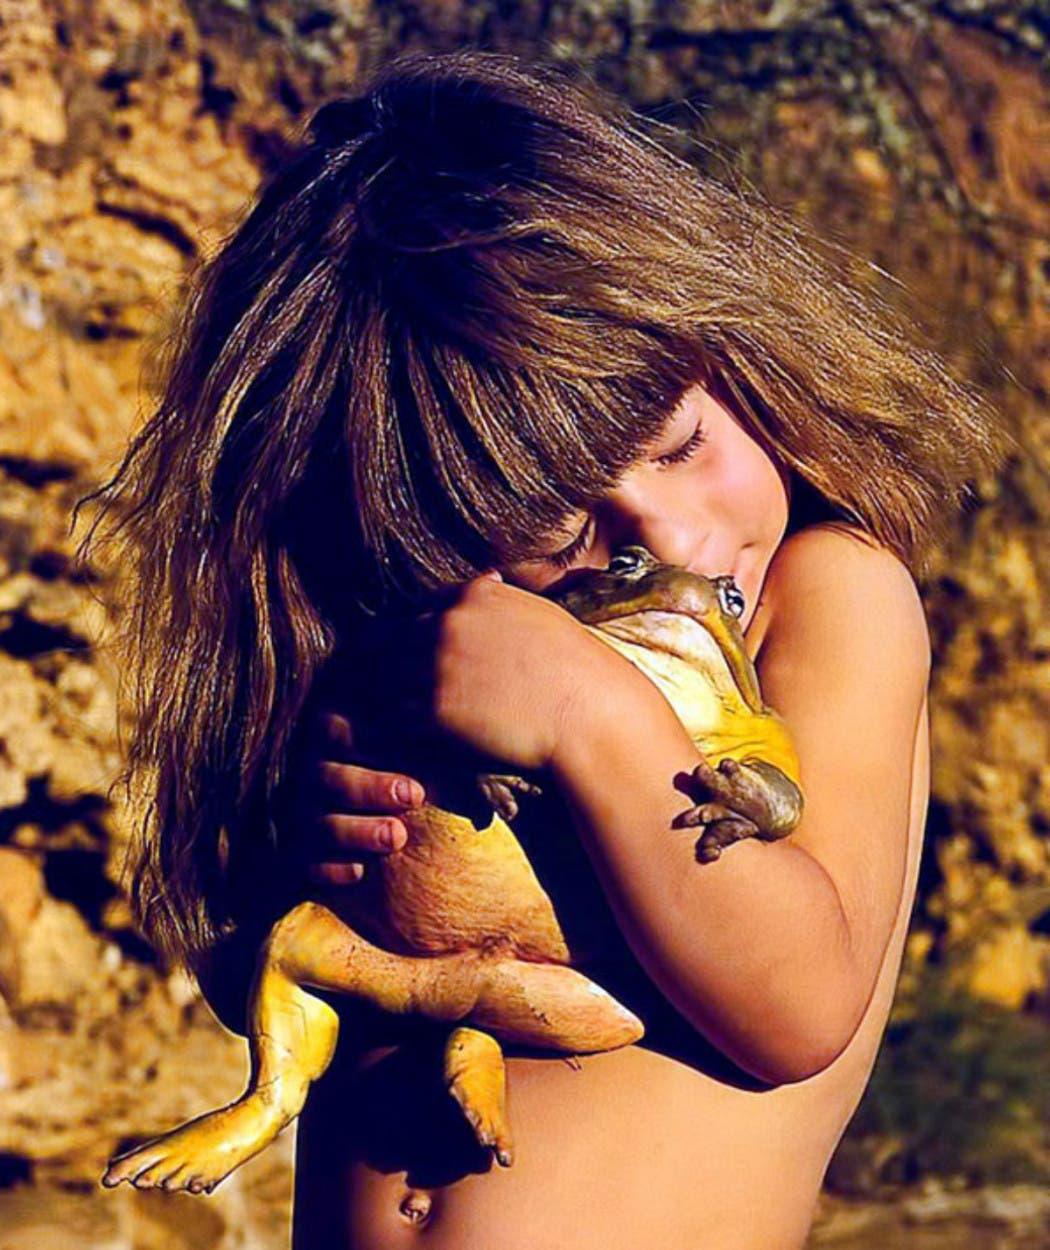 frog-hugging-little-girl-tippi-africa-pic-photo